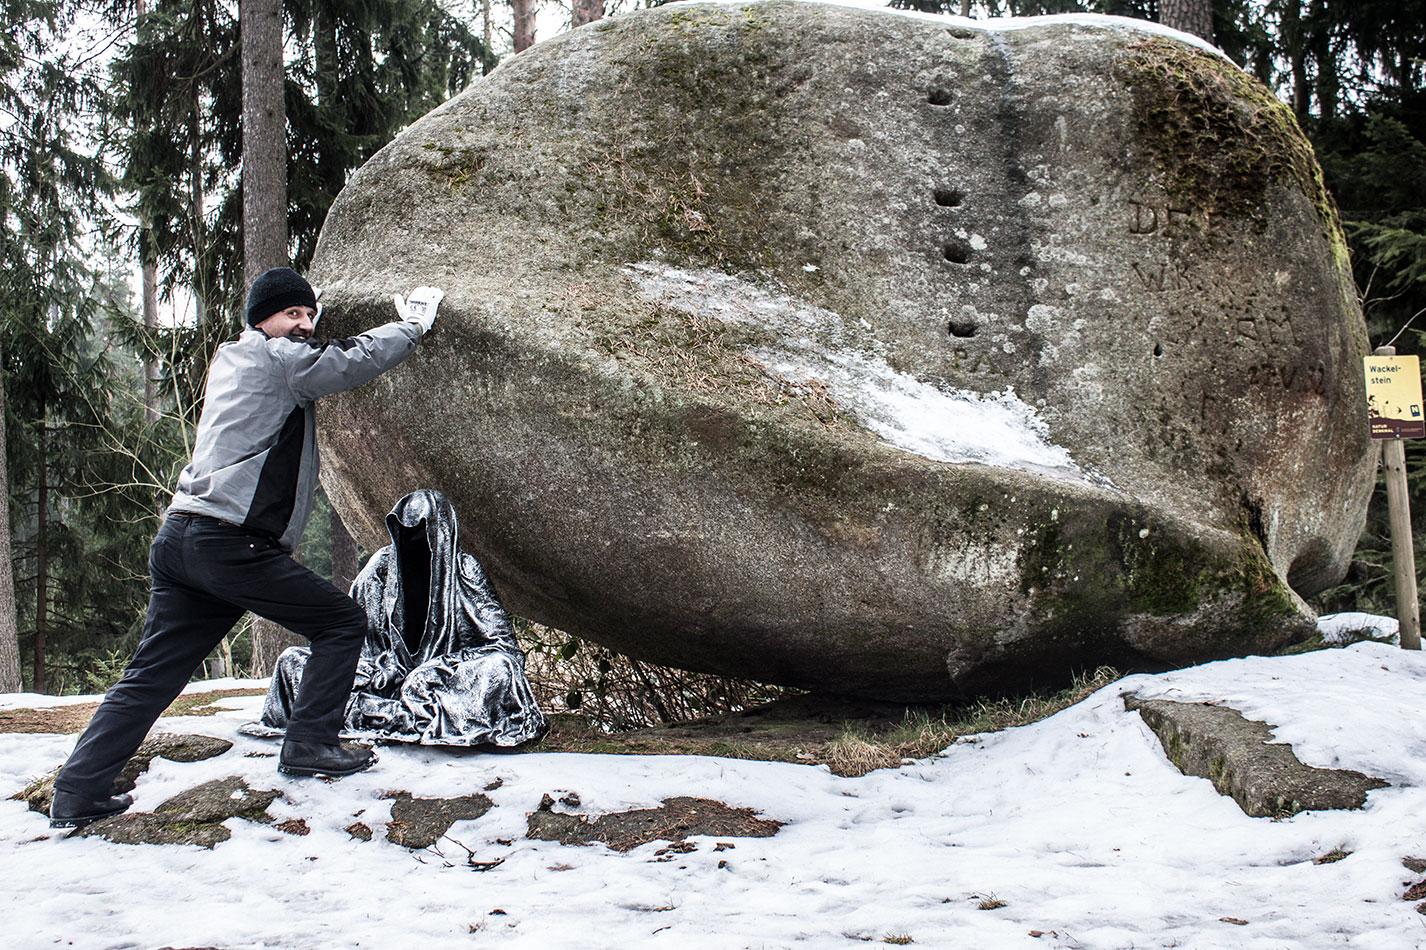 waldviertel-wackelsteine-moving-stones-contemporary-art-design-photography-arts-antique-guardians-of-time-manfred-kili-kielnhofer-7694